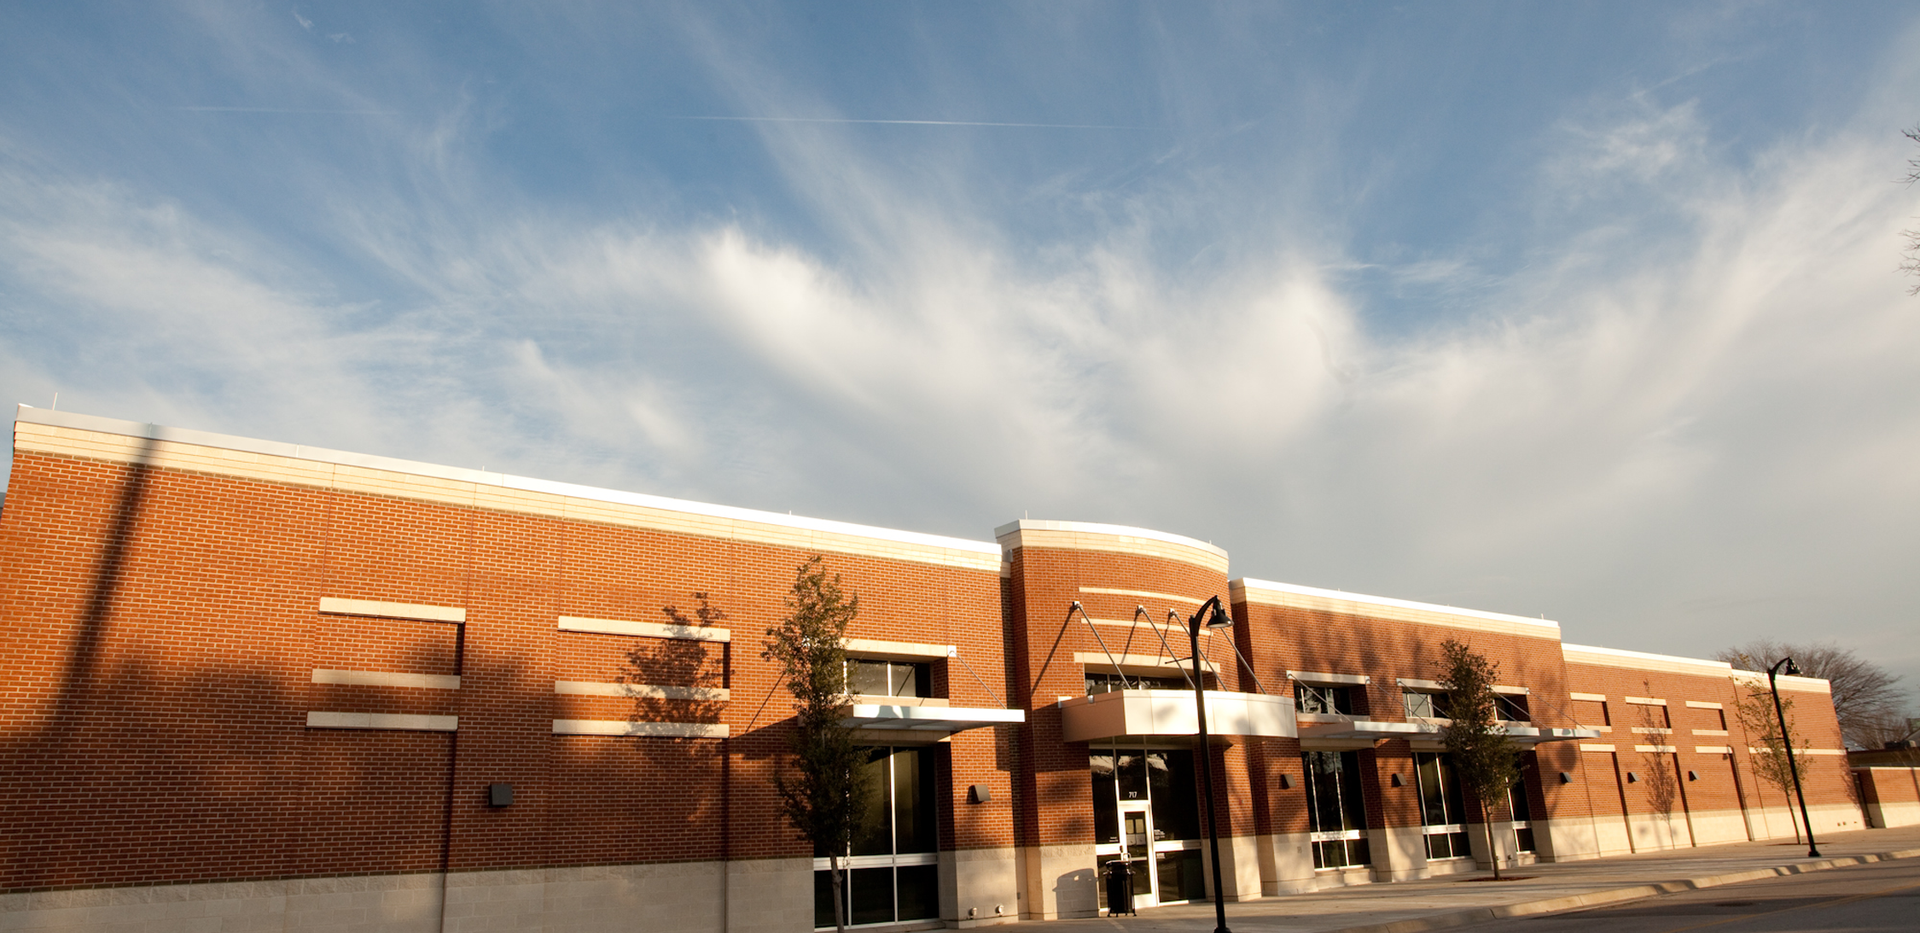 City of Garland - Admin. Building